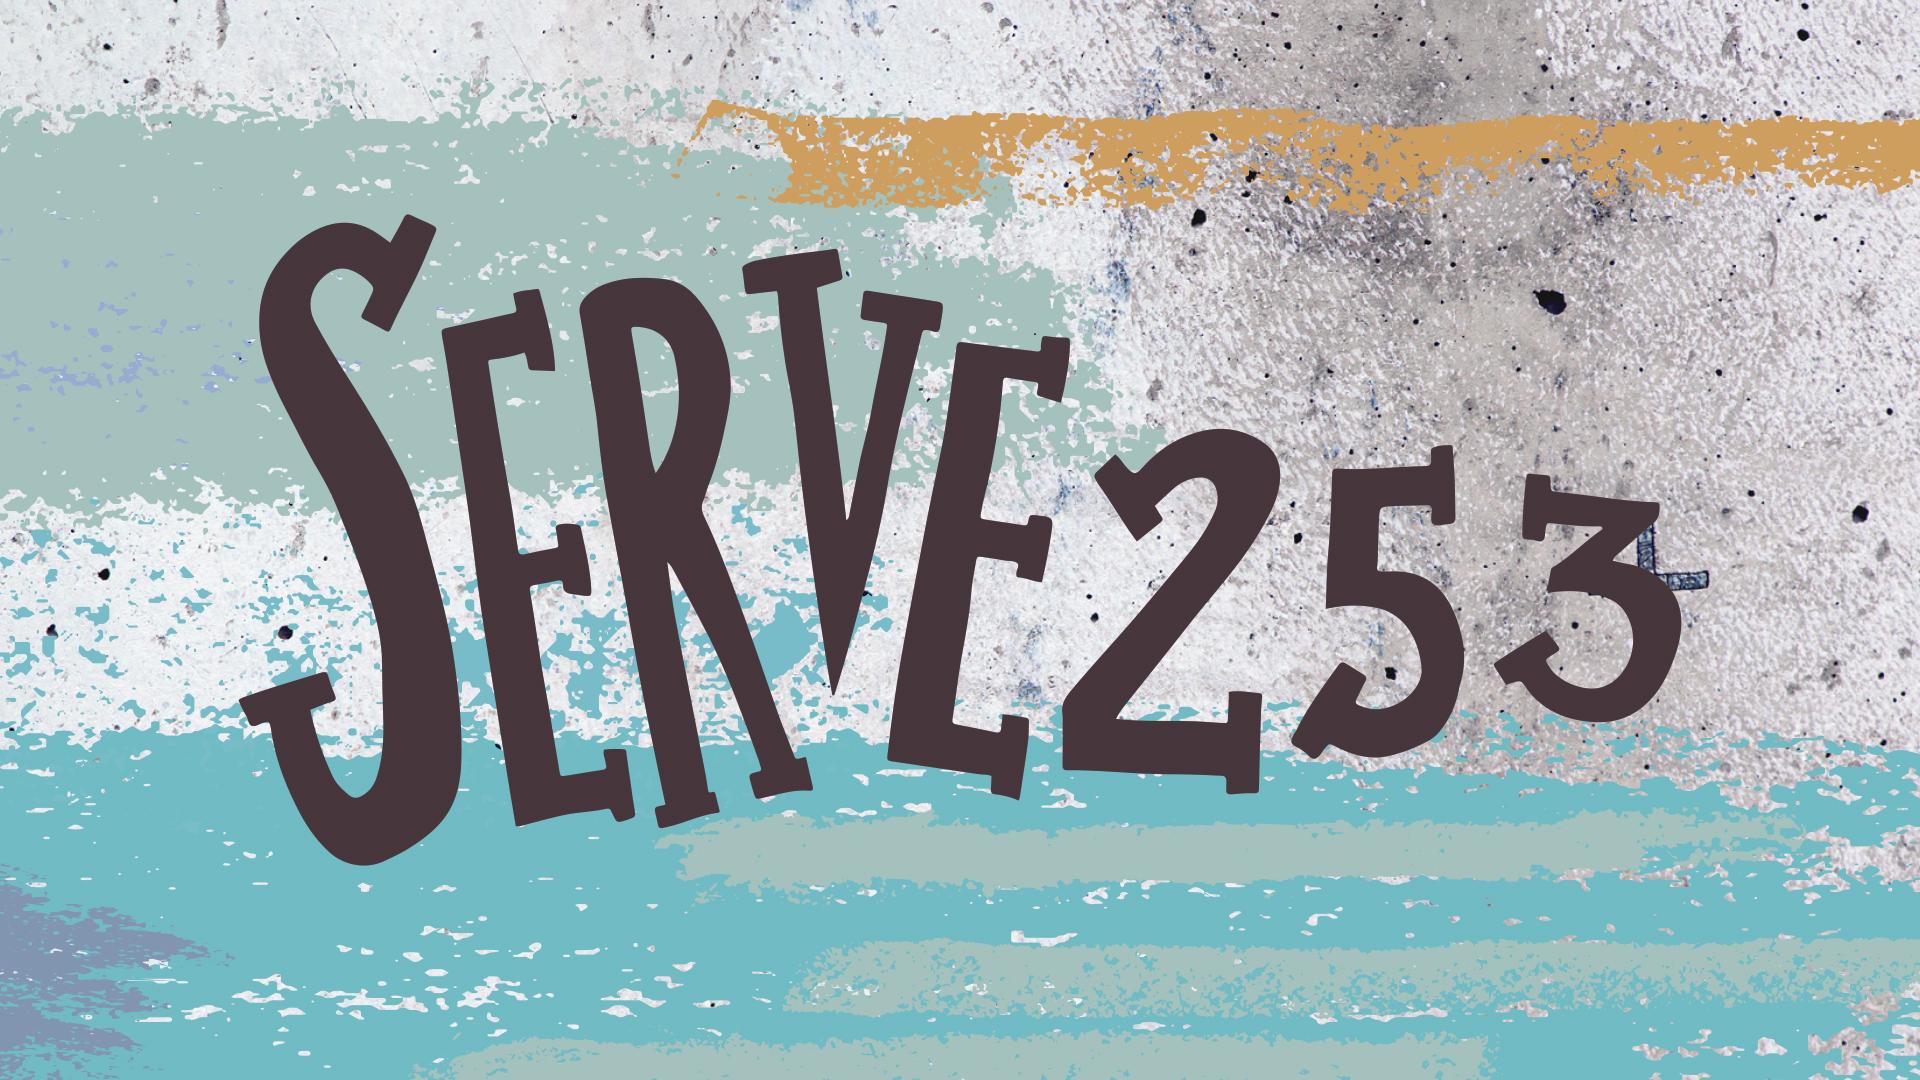 Life Center Central | Serve253